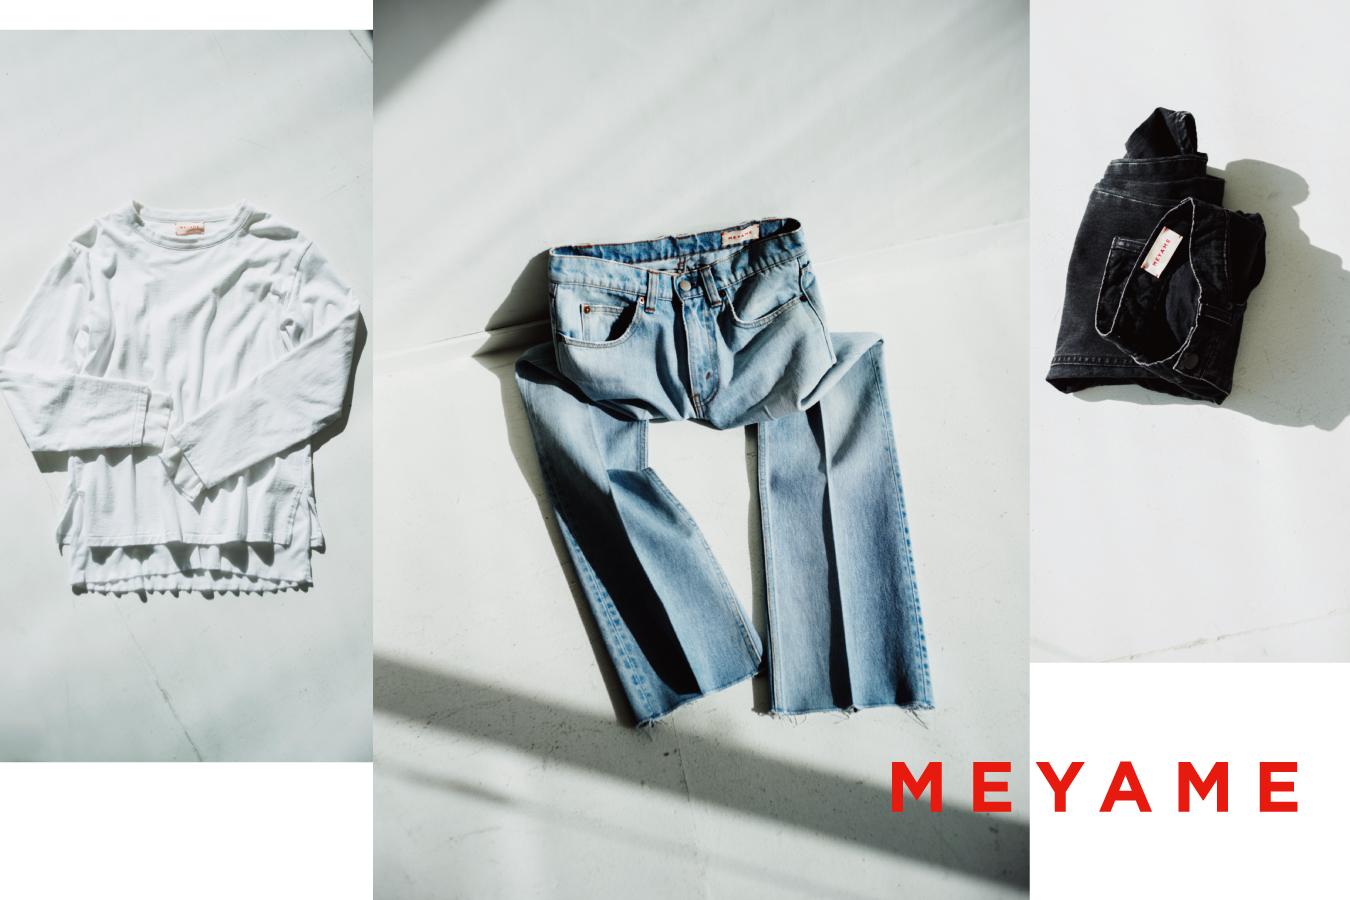 【MEYAME】大人の女性に提案するデザイン